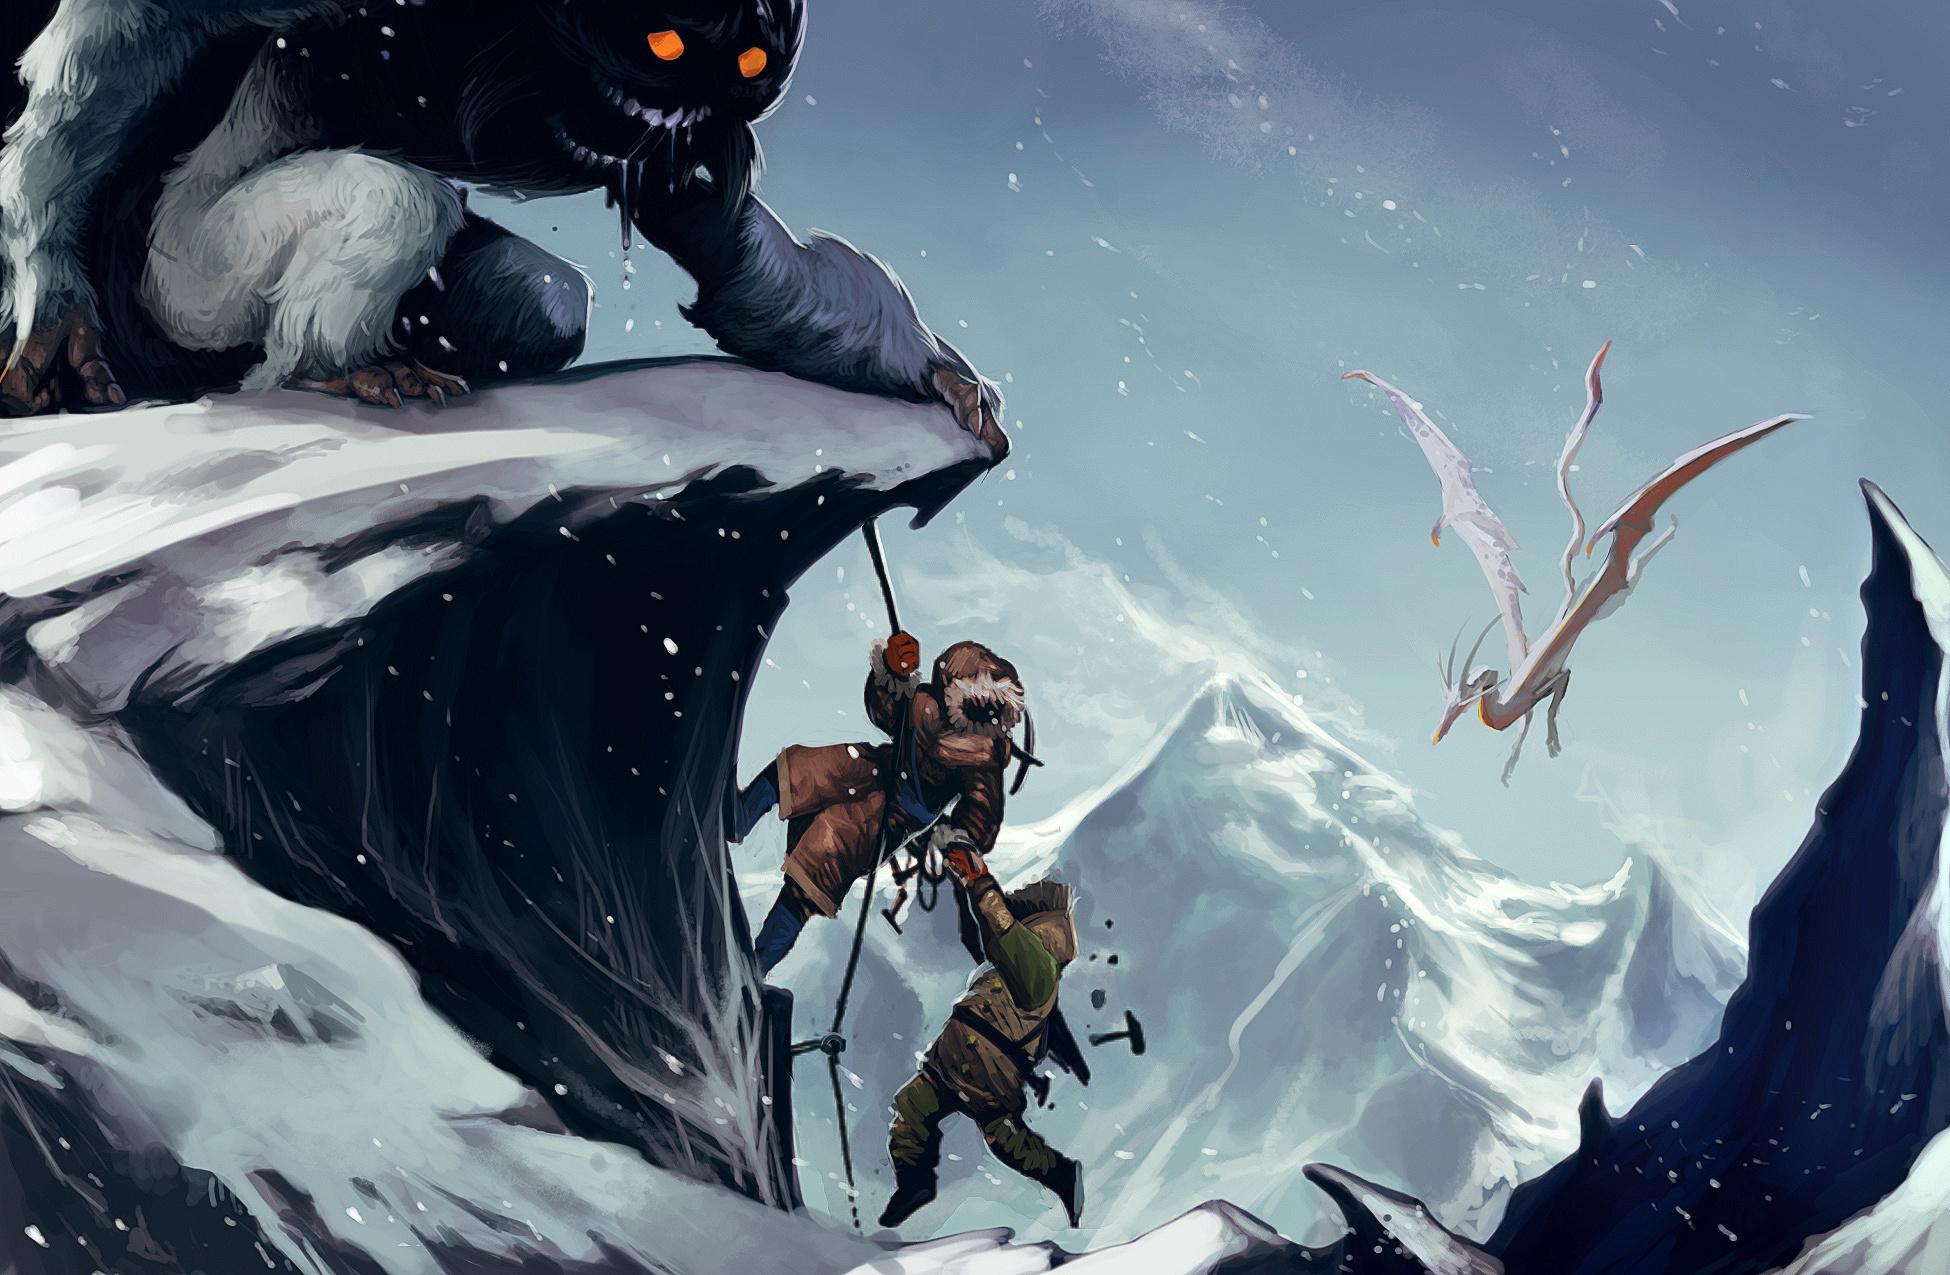 Adventure Art Id 75426 Art Abyss